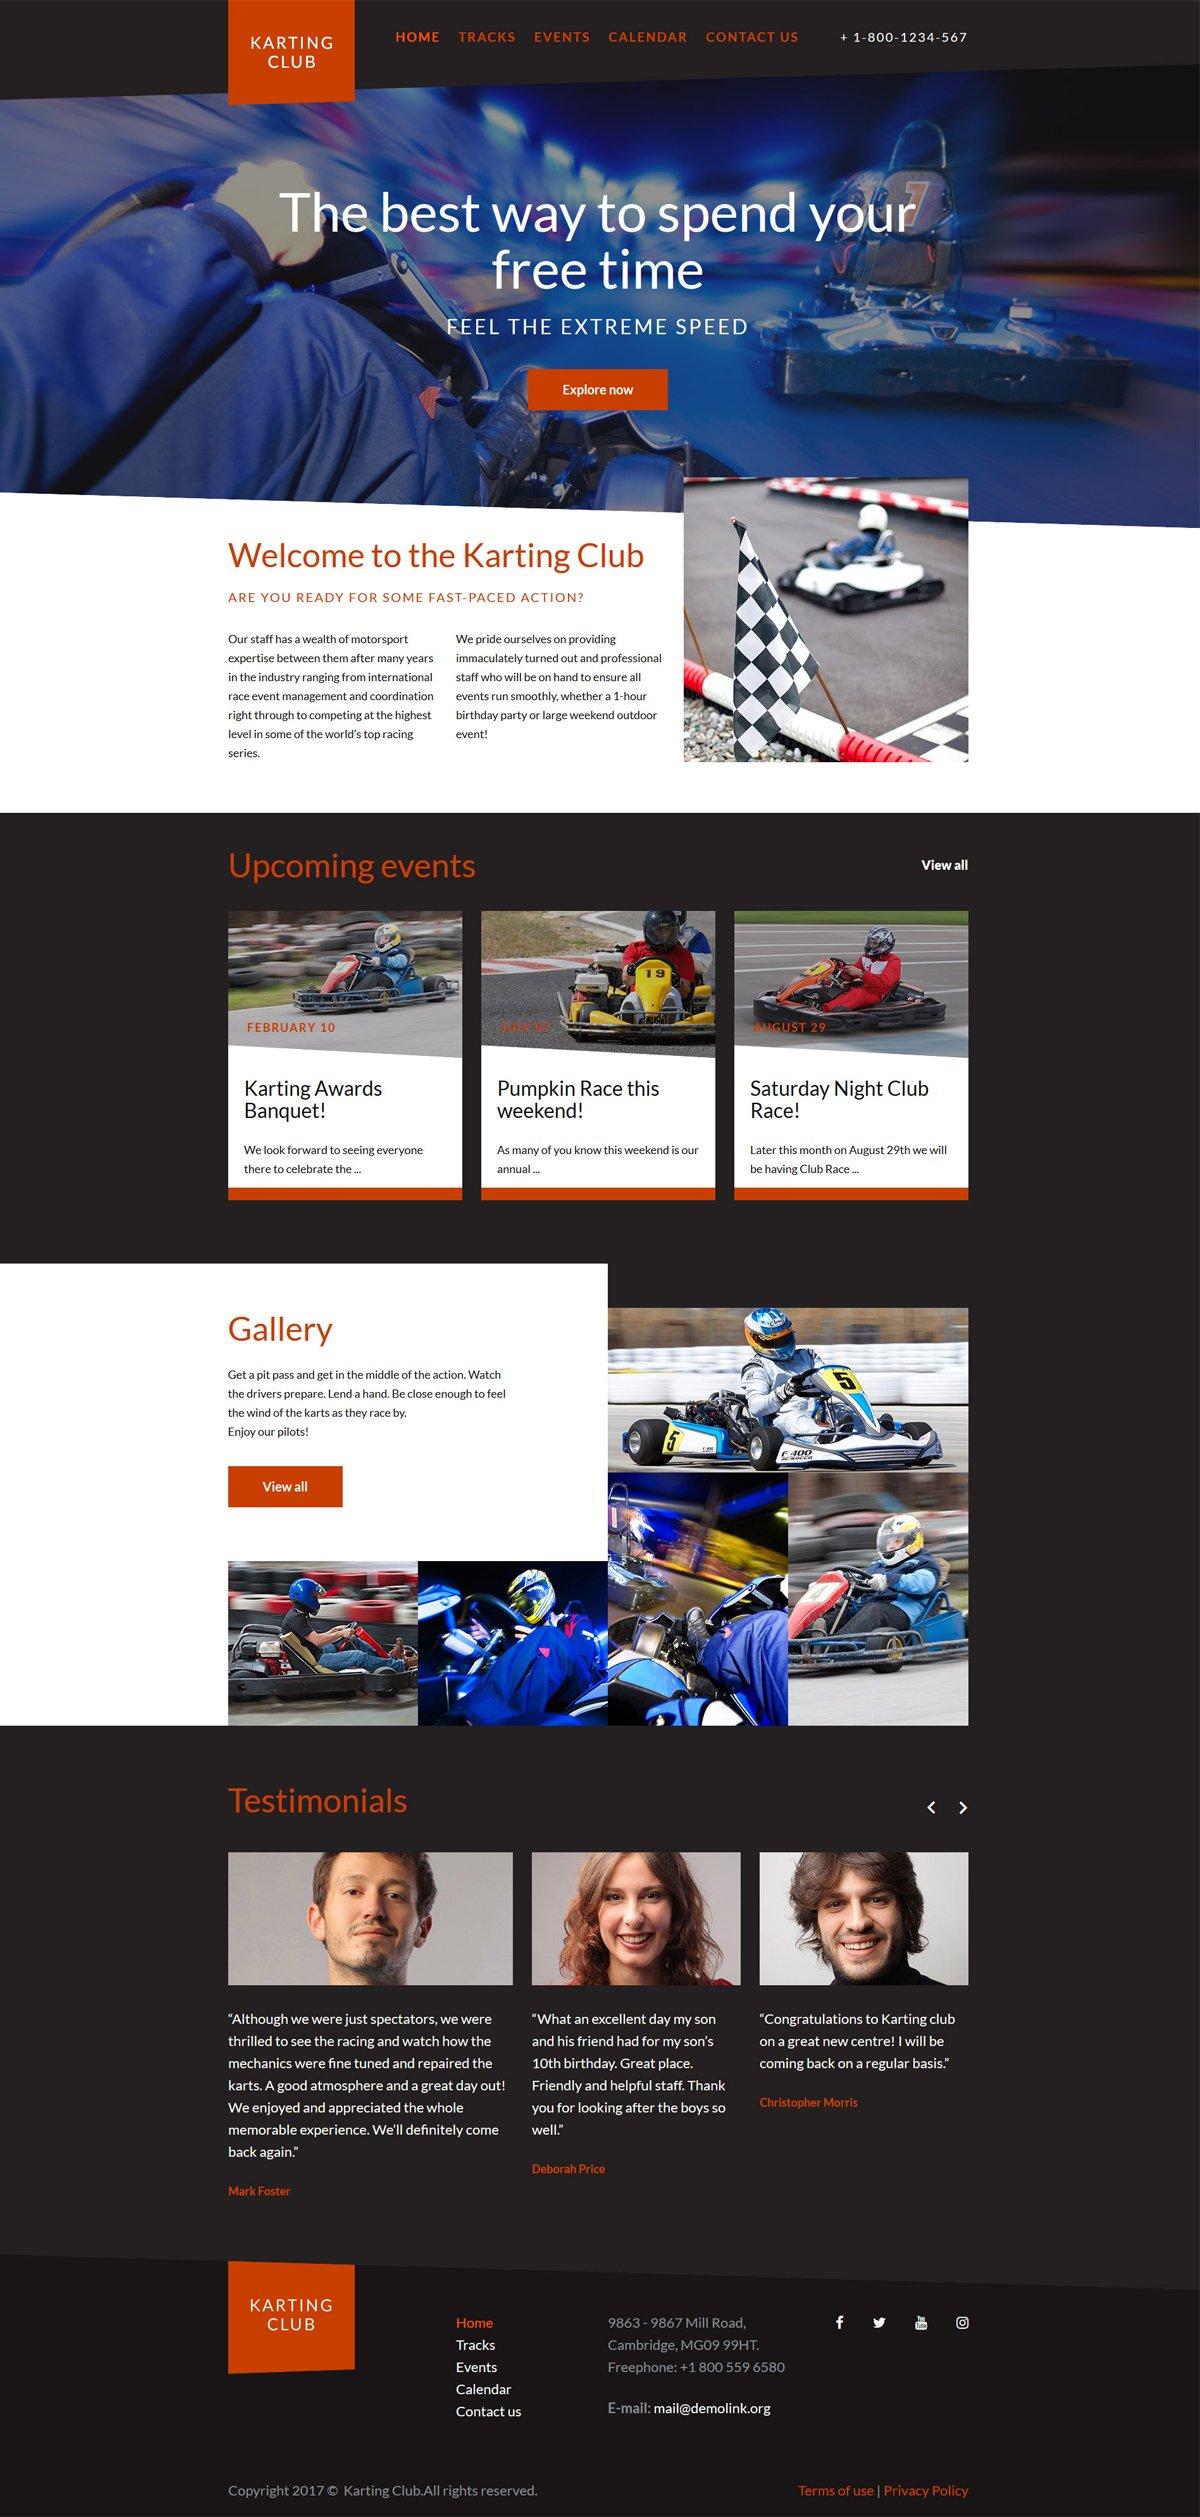 Karting Club - Karting Club Responsive Website Template